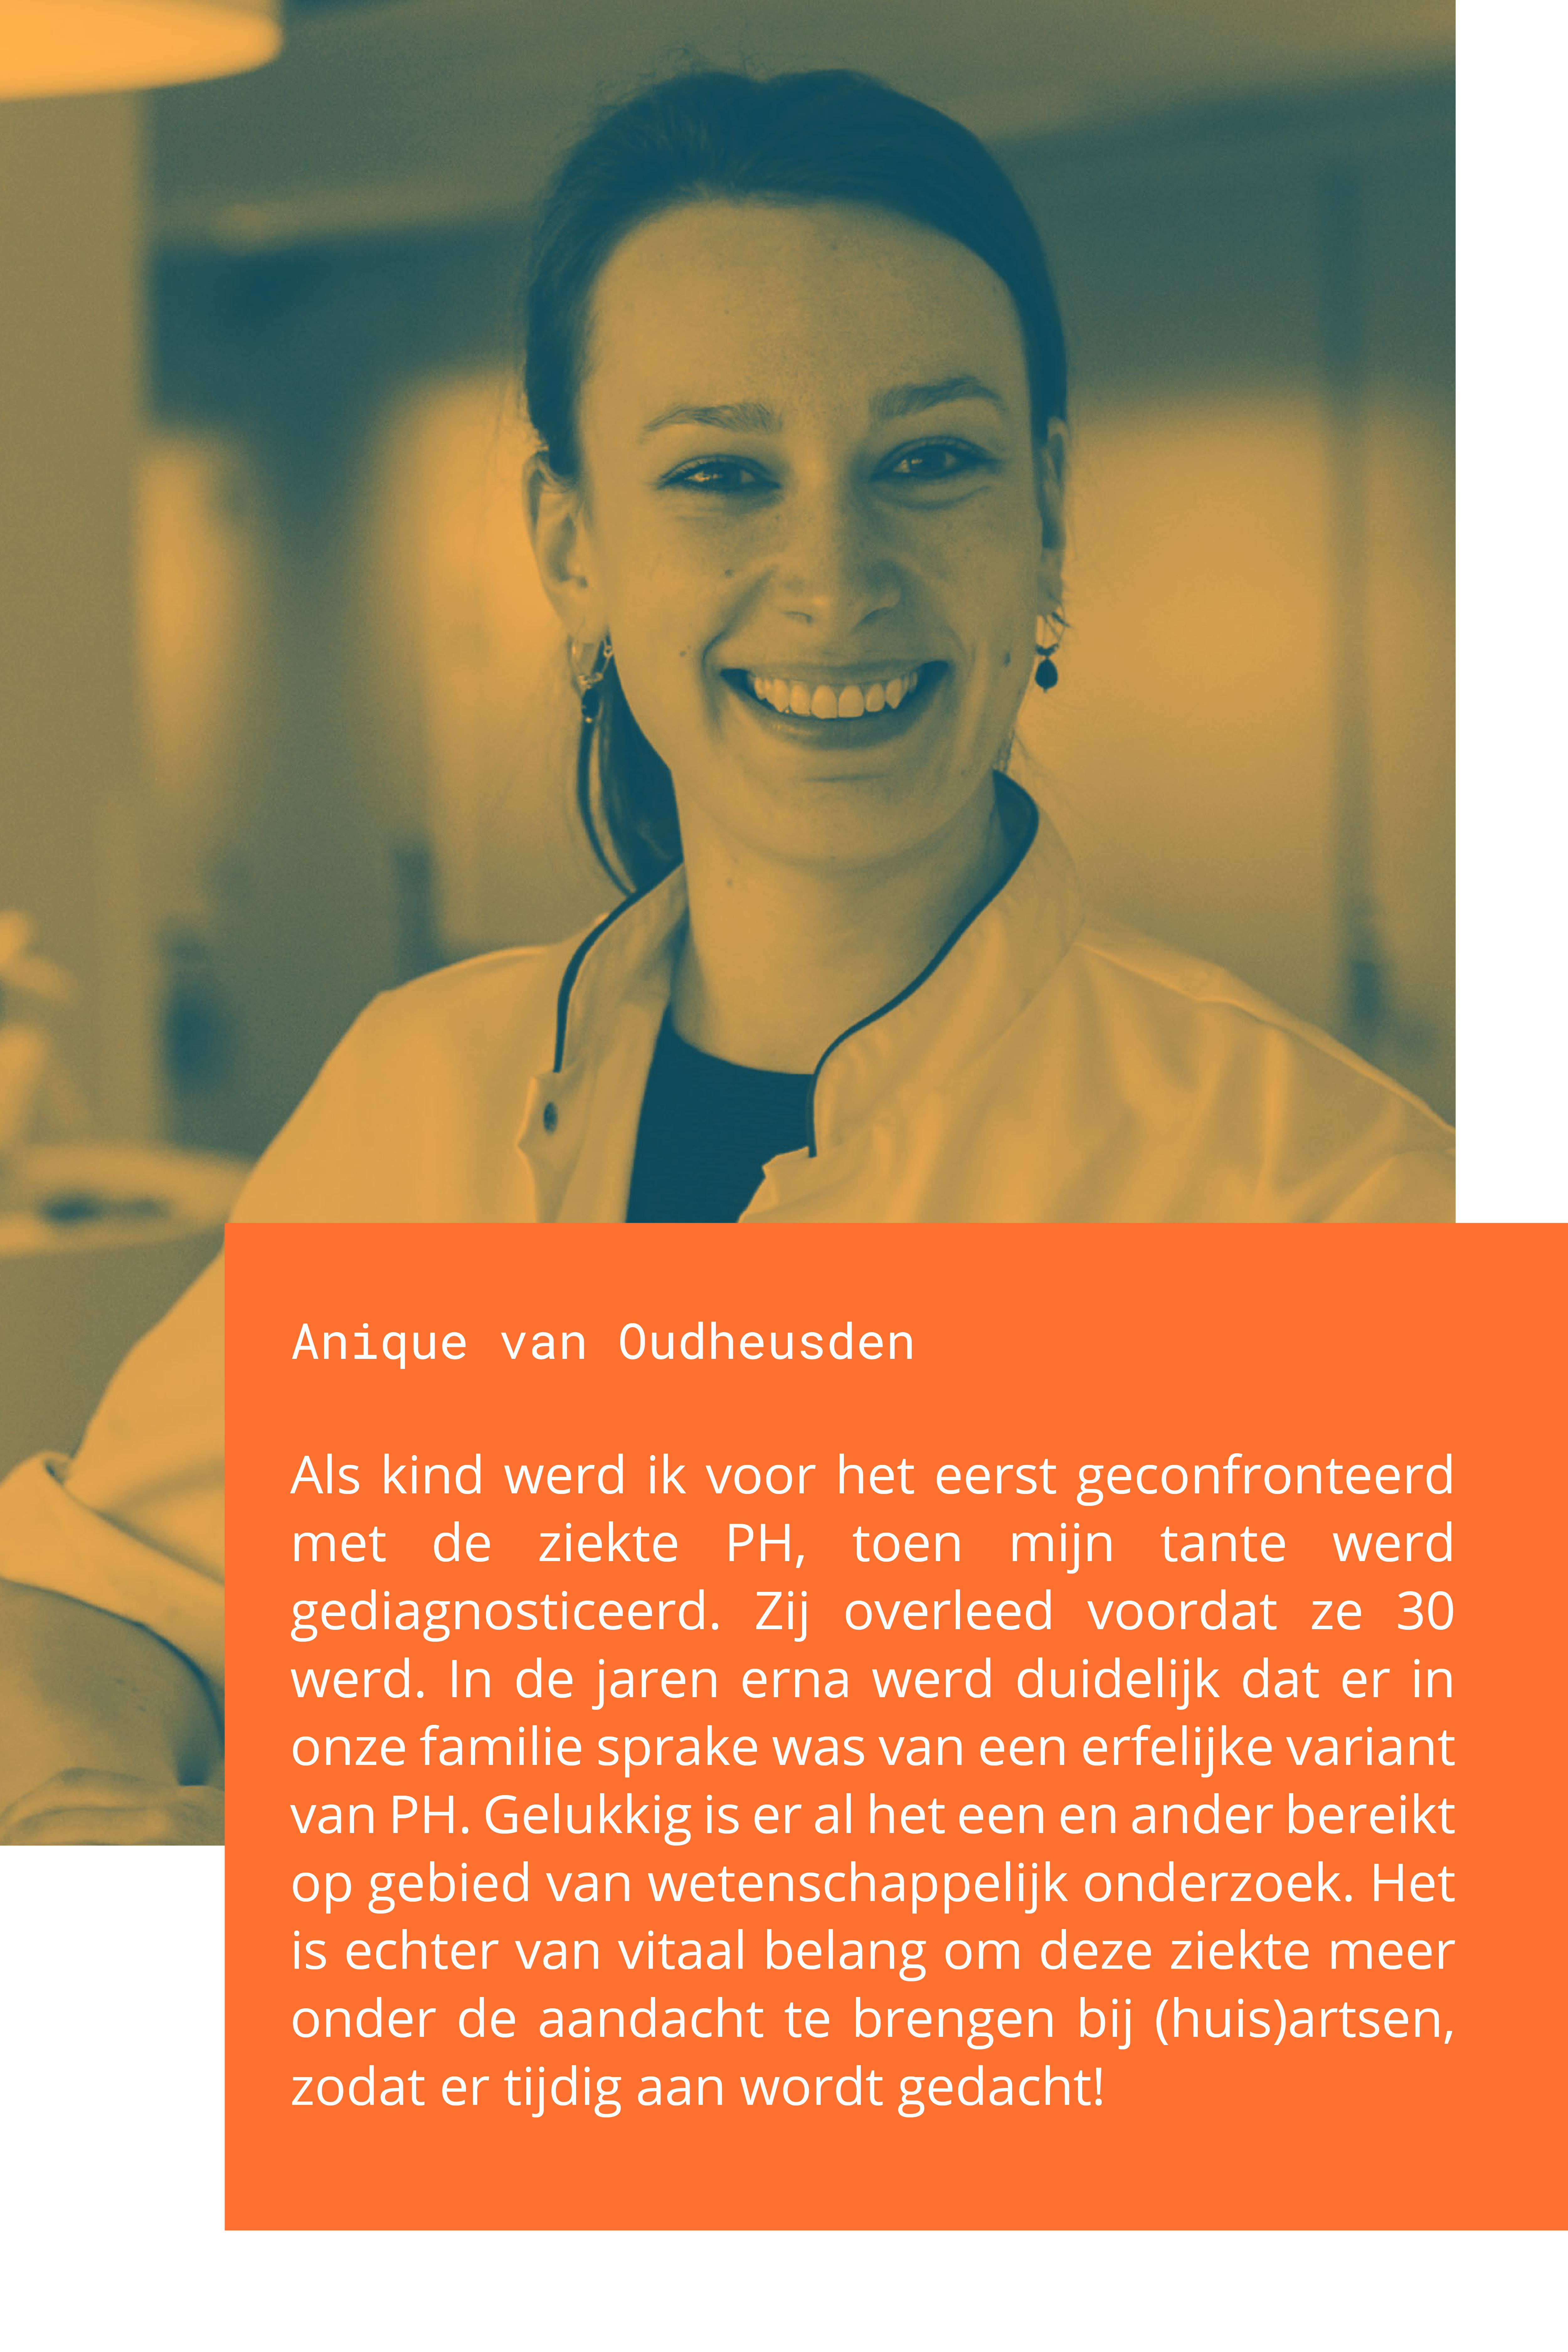 Adembenemend 2020 - Social - Anique van Oudheusden